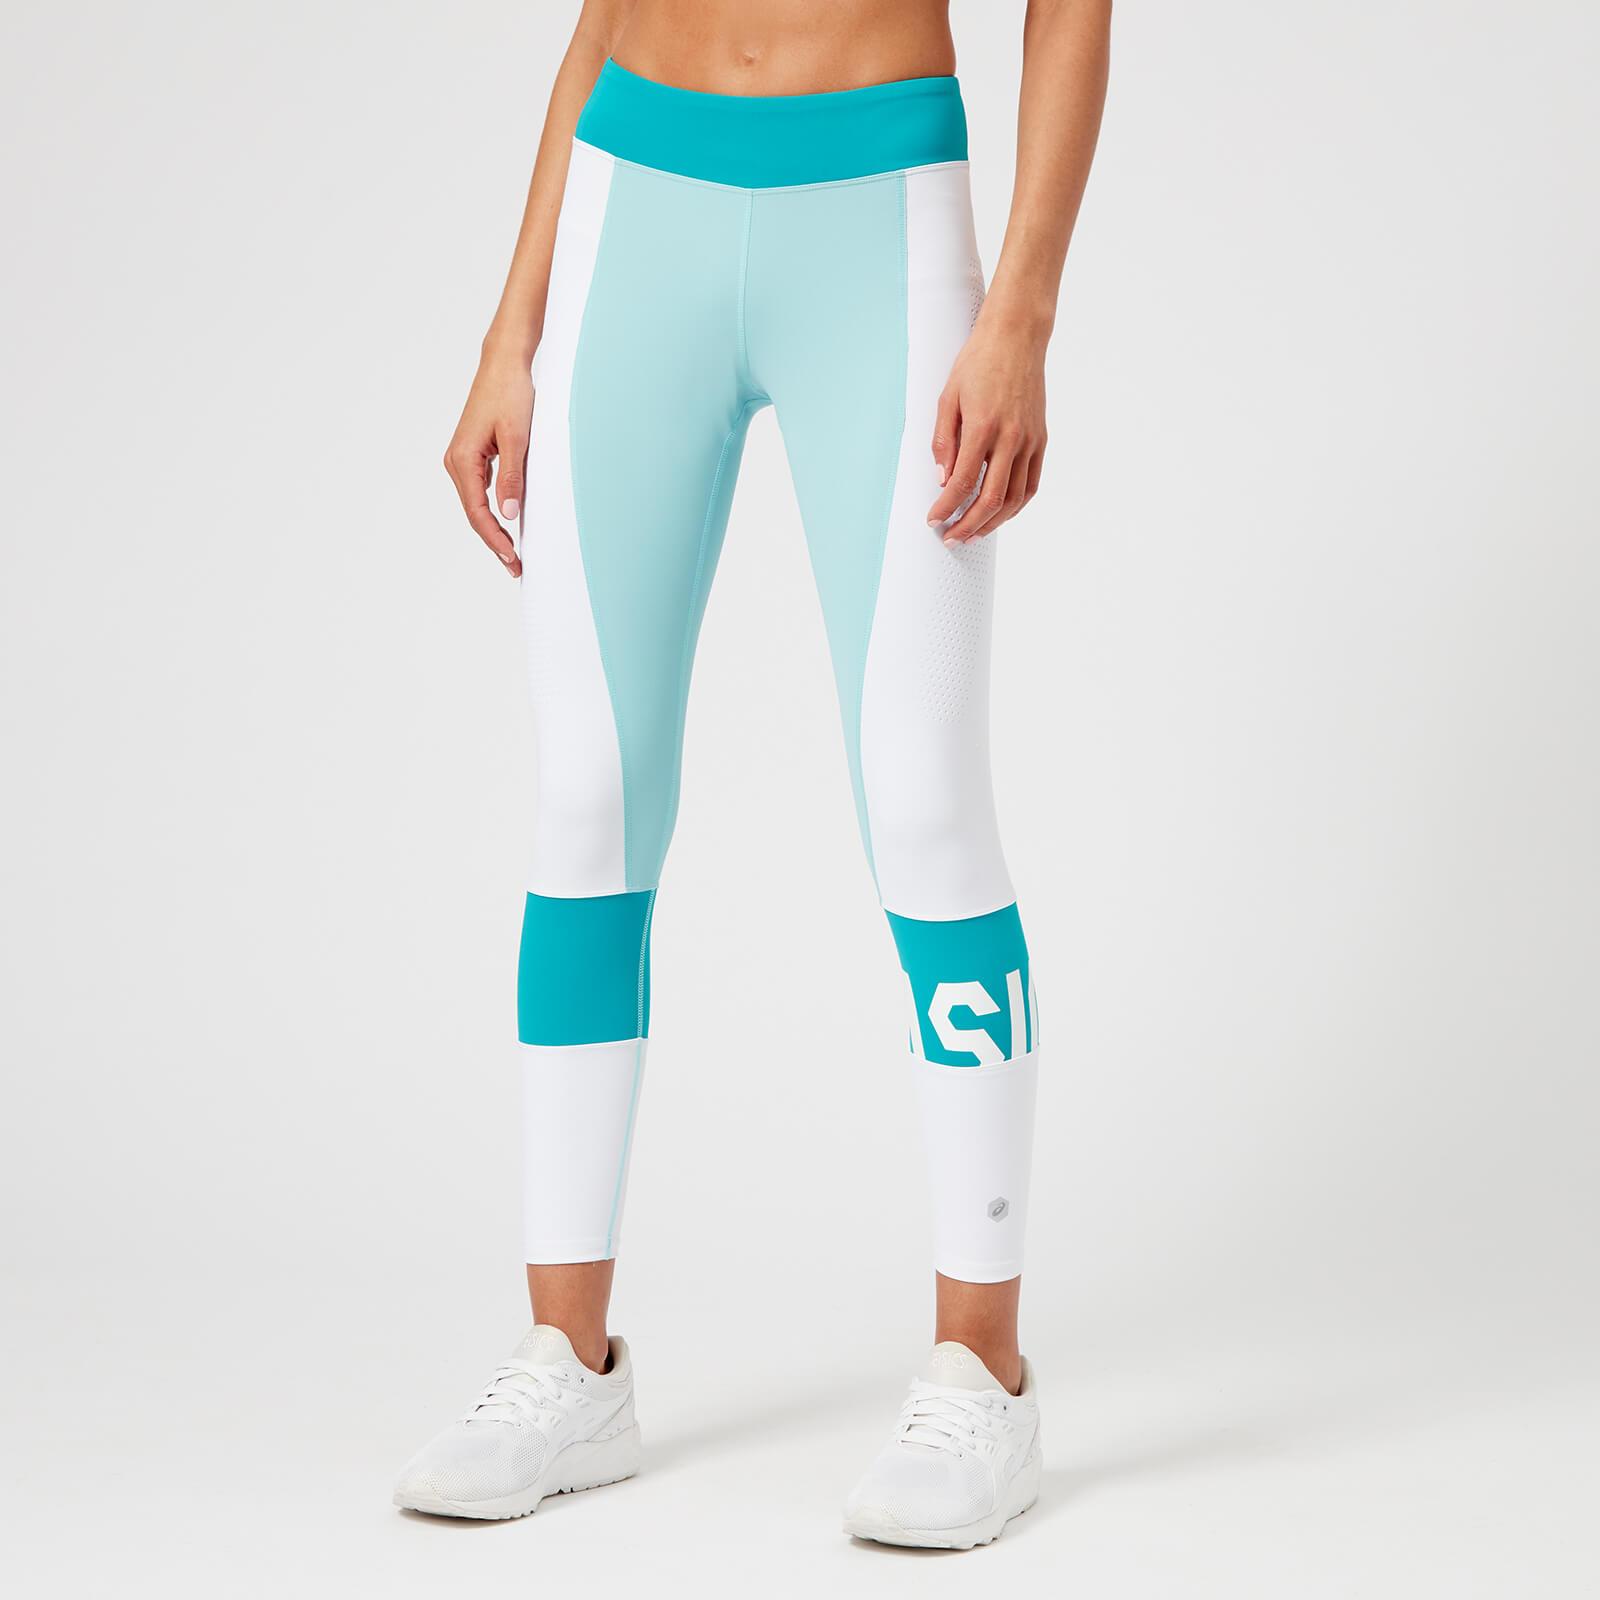 dd80315278c2 Asics Running Women s Colour Block 7 8 Tights - Porcelain Blue ...